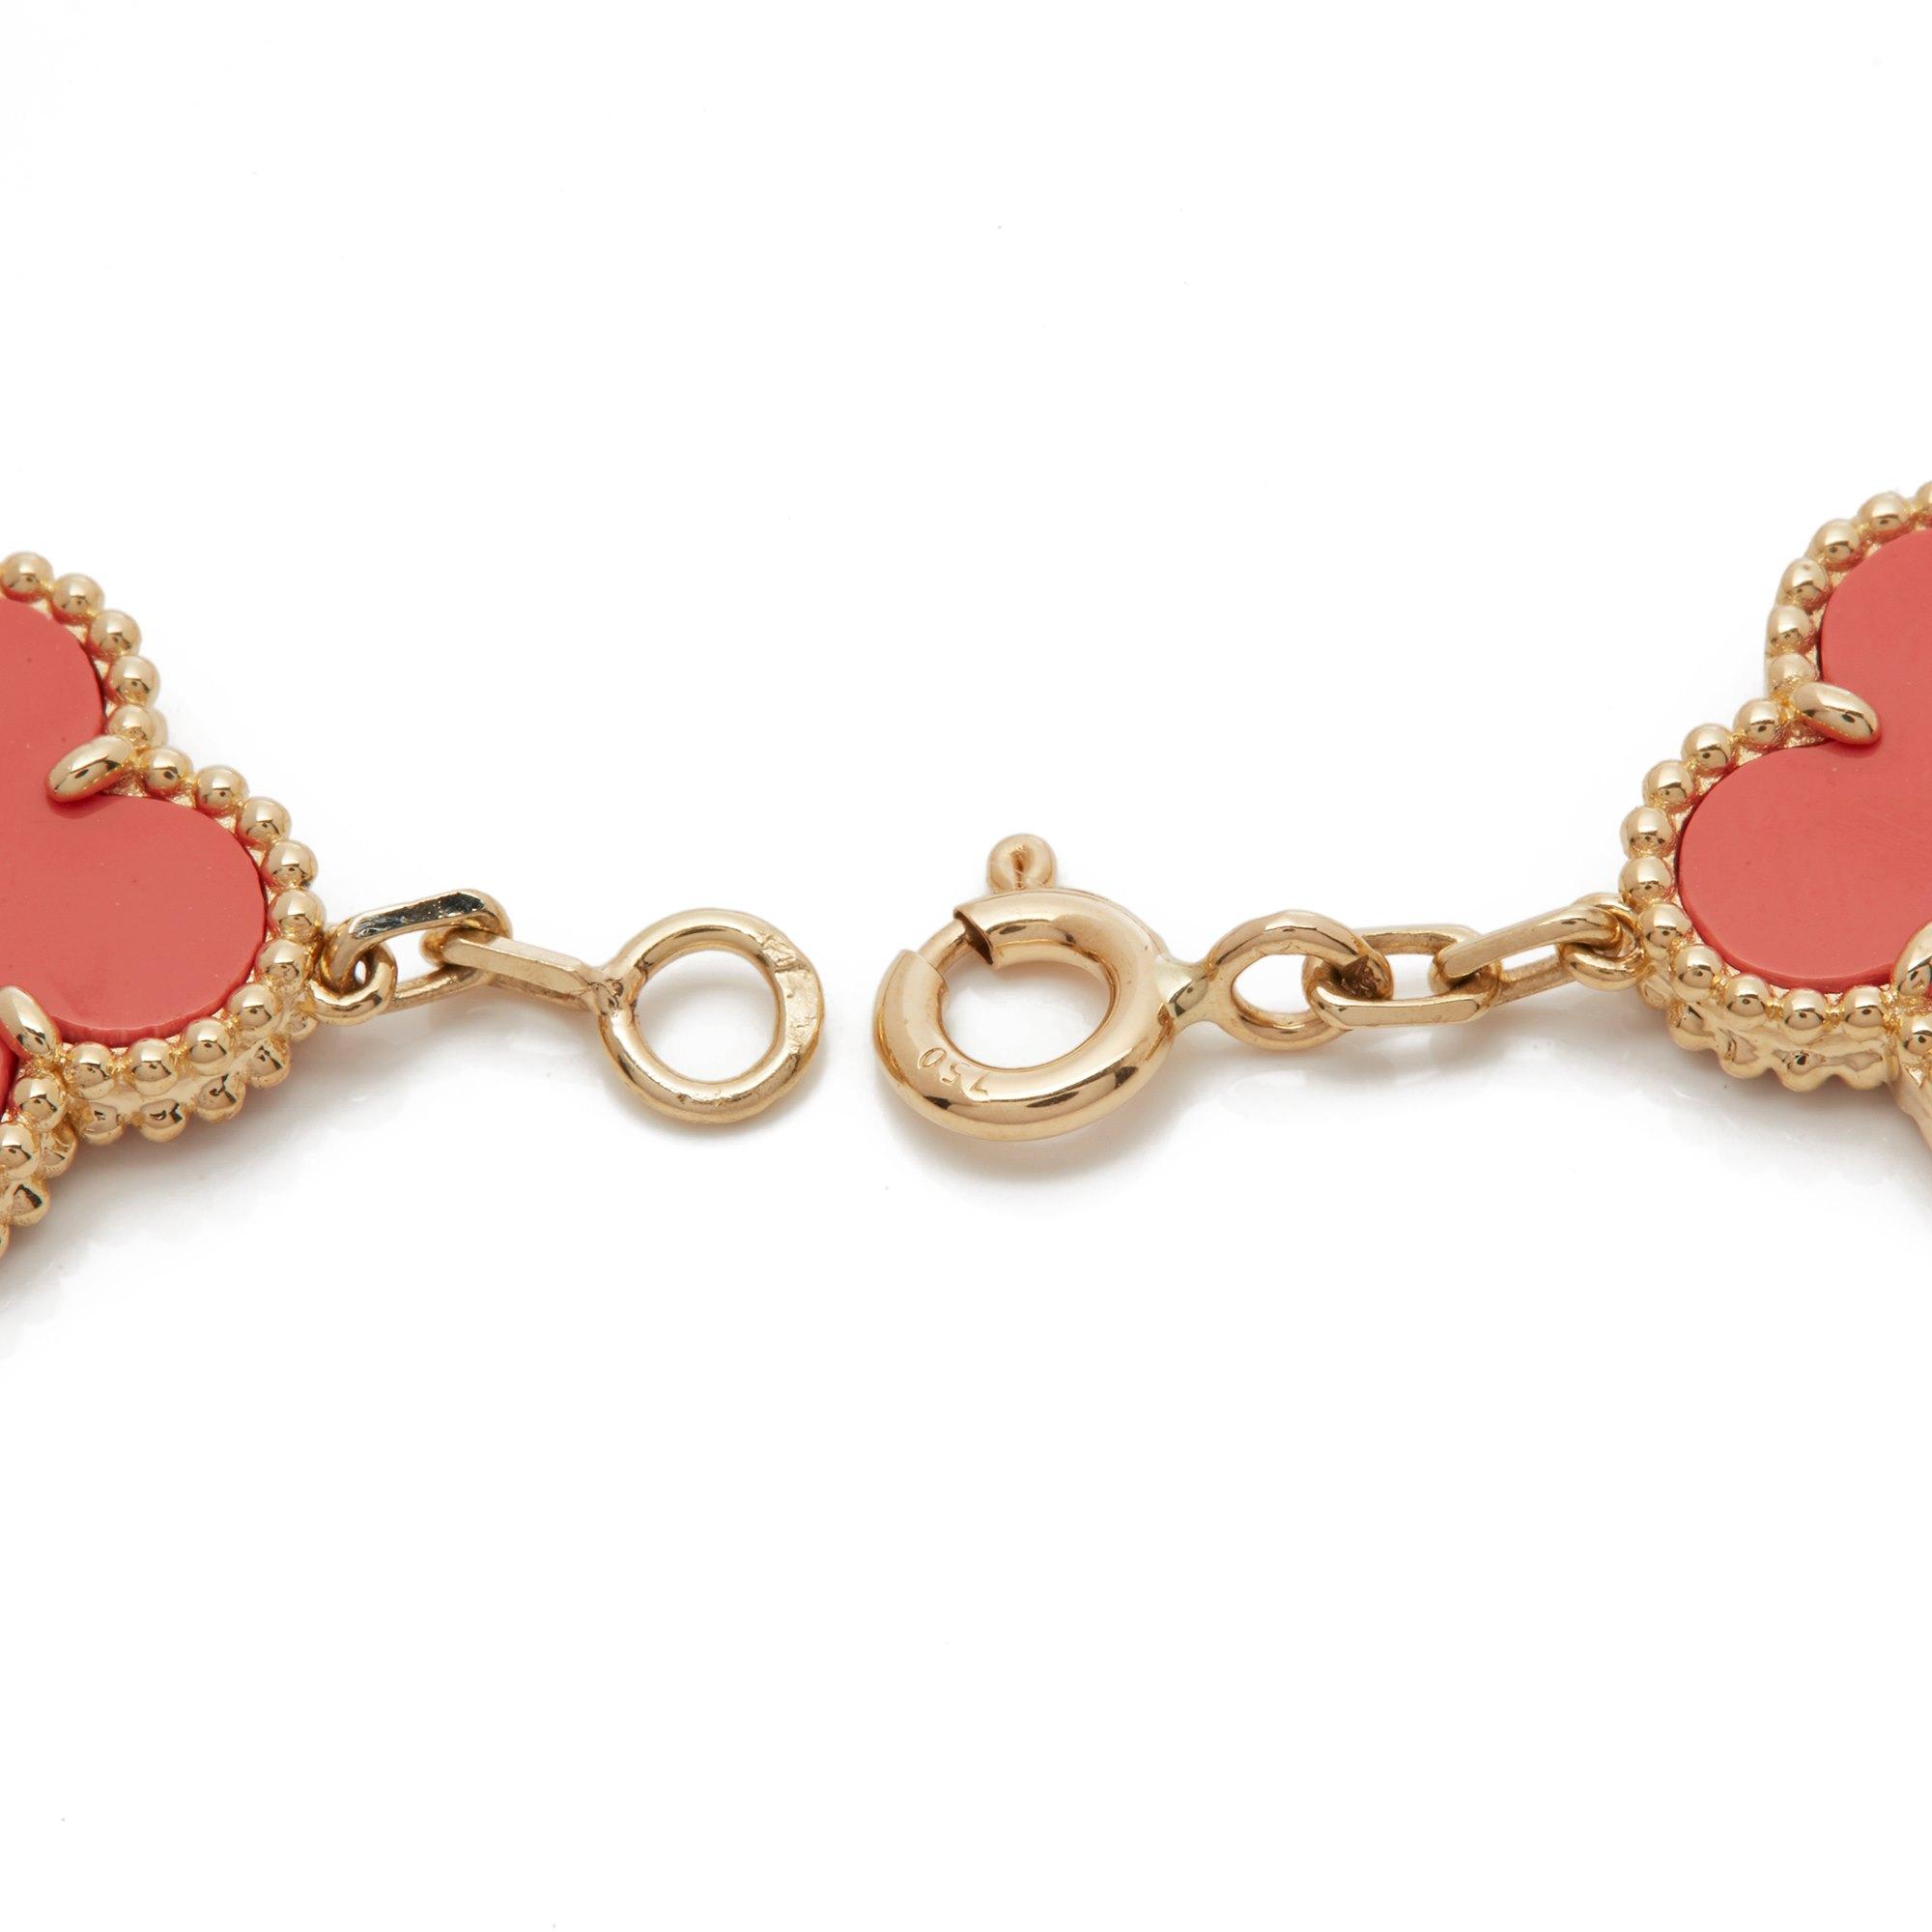 Van Cleef & Arpels 18k Yellow Gold Coral 5 Motif Vintage Alhambra Bracelet